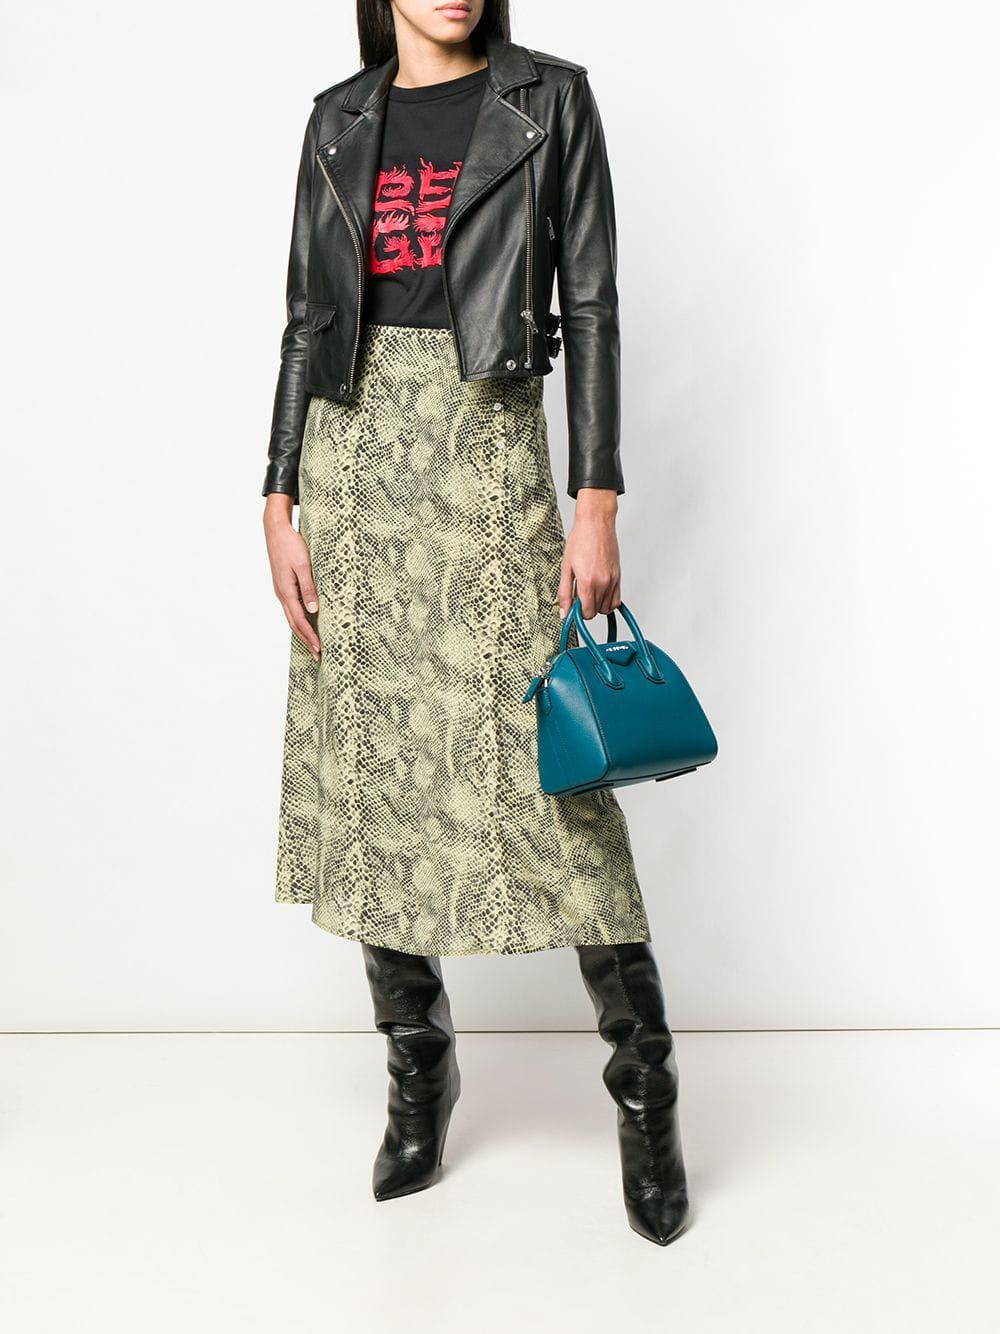 bd0bb14c8d Lyst - Givenchy Antigona Mini Leather Bag in Green